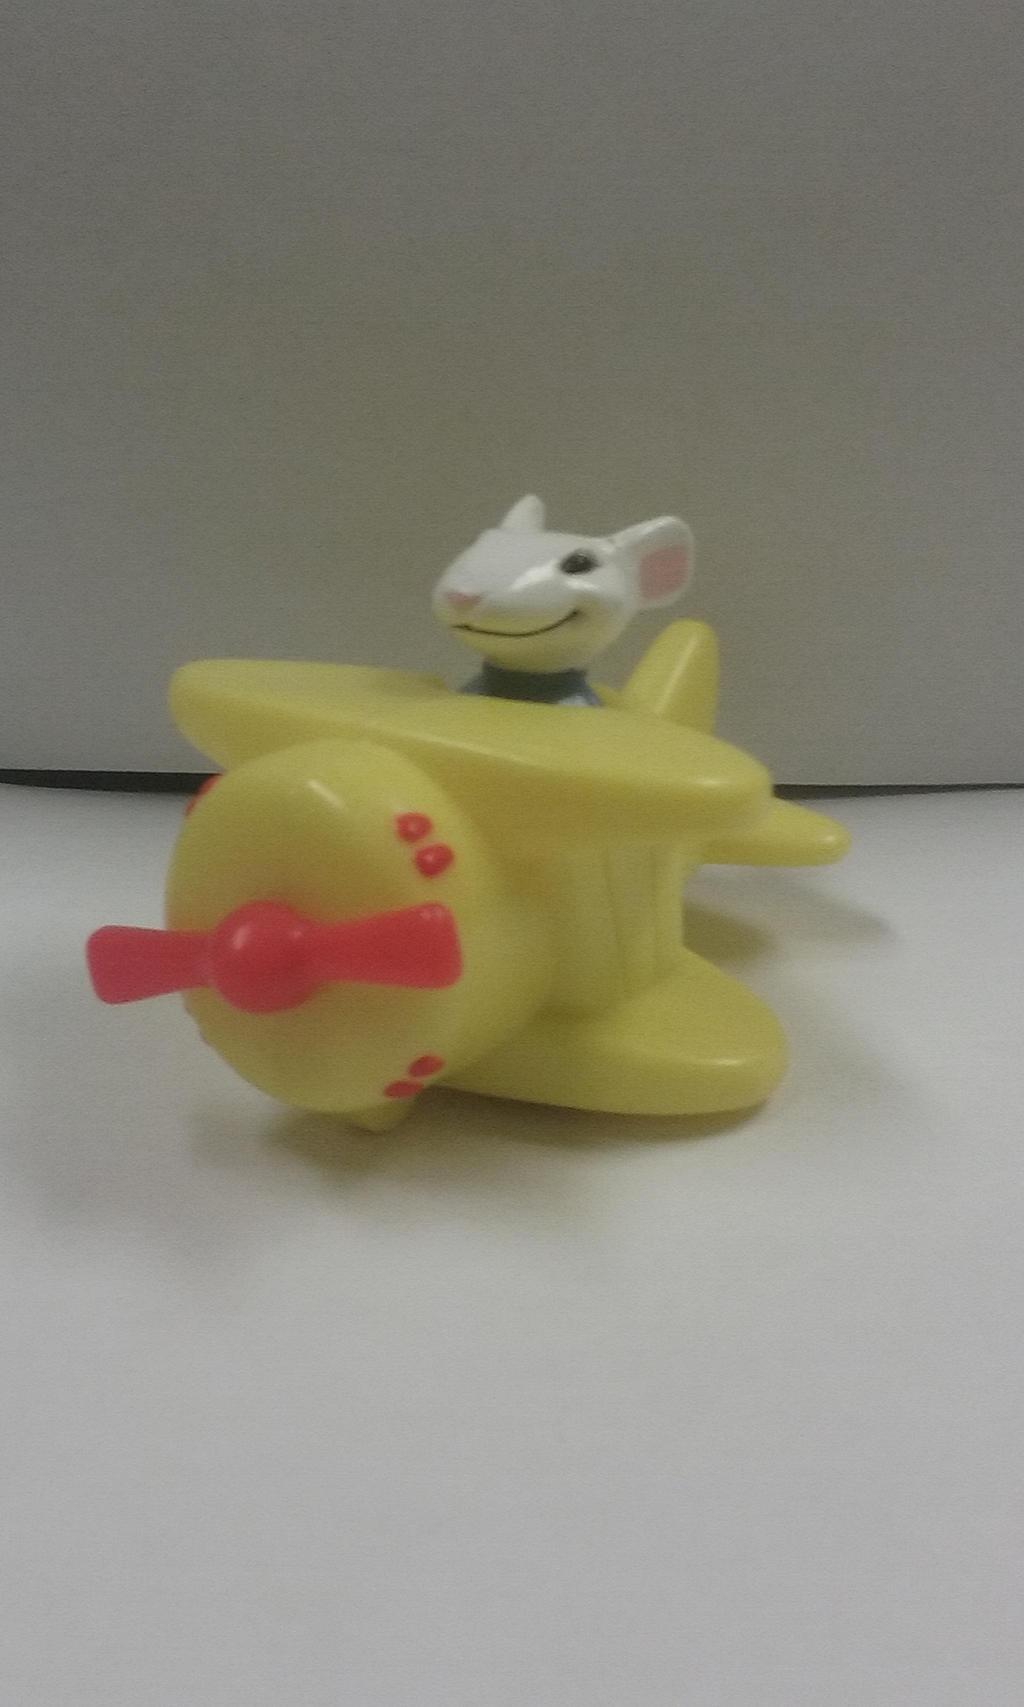 Carl S Jr Stuart Little 2 Plane Toy 2003 By Duel Express On Deviantart